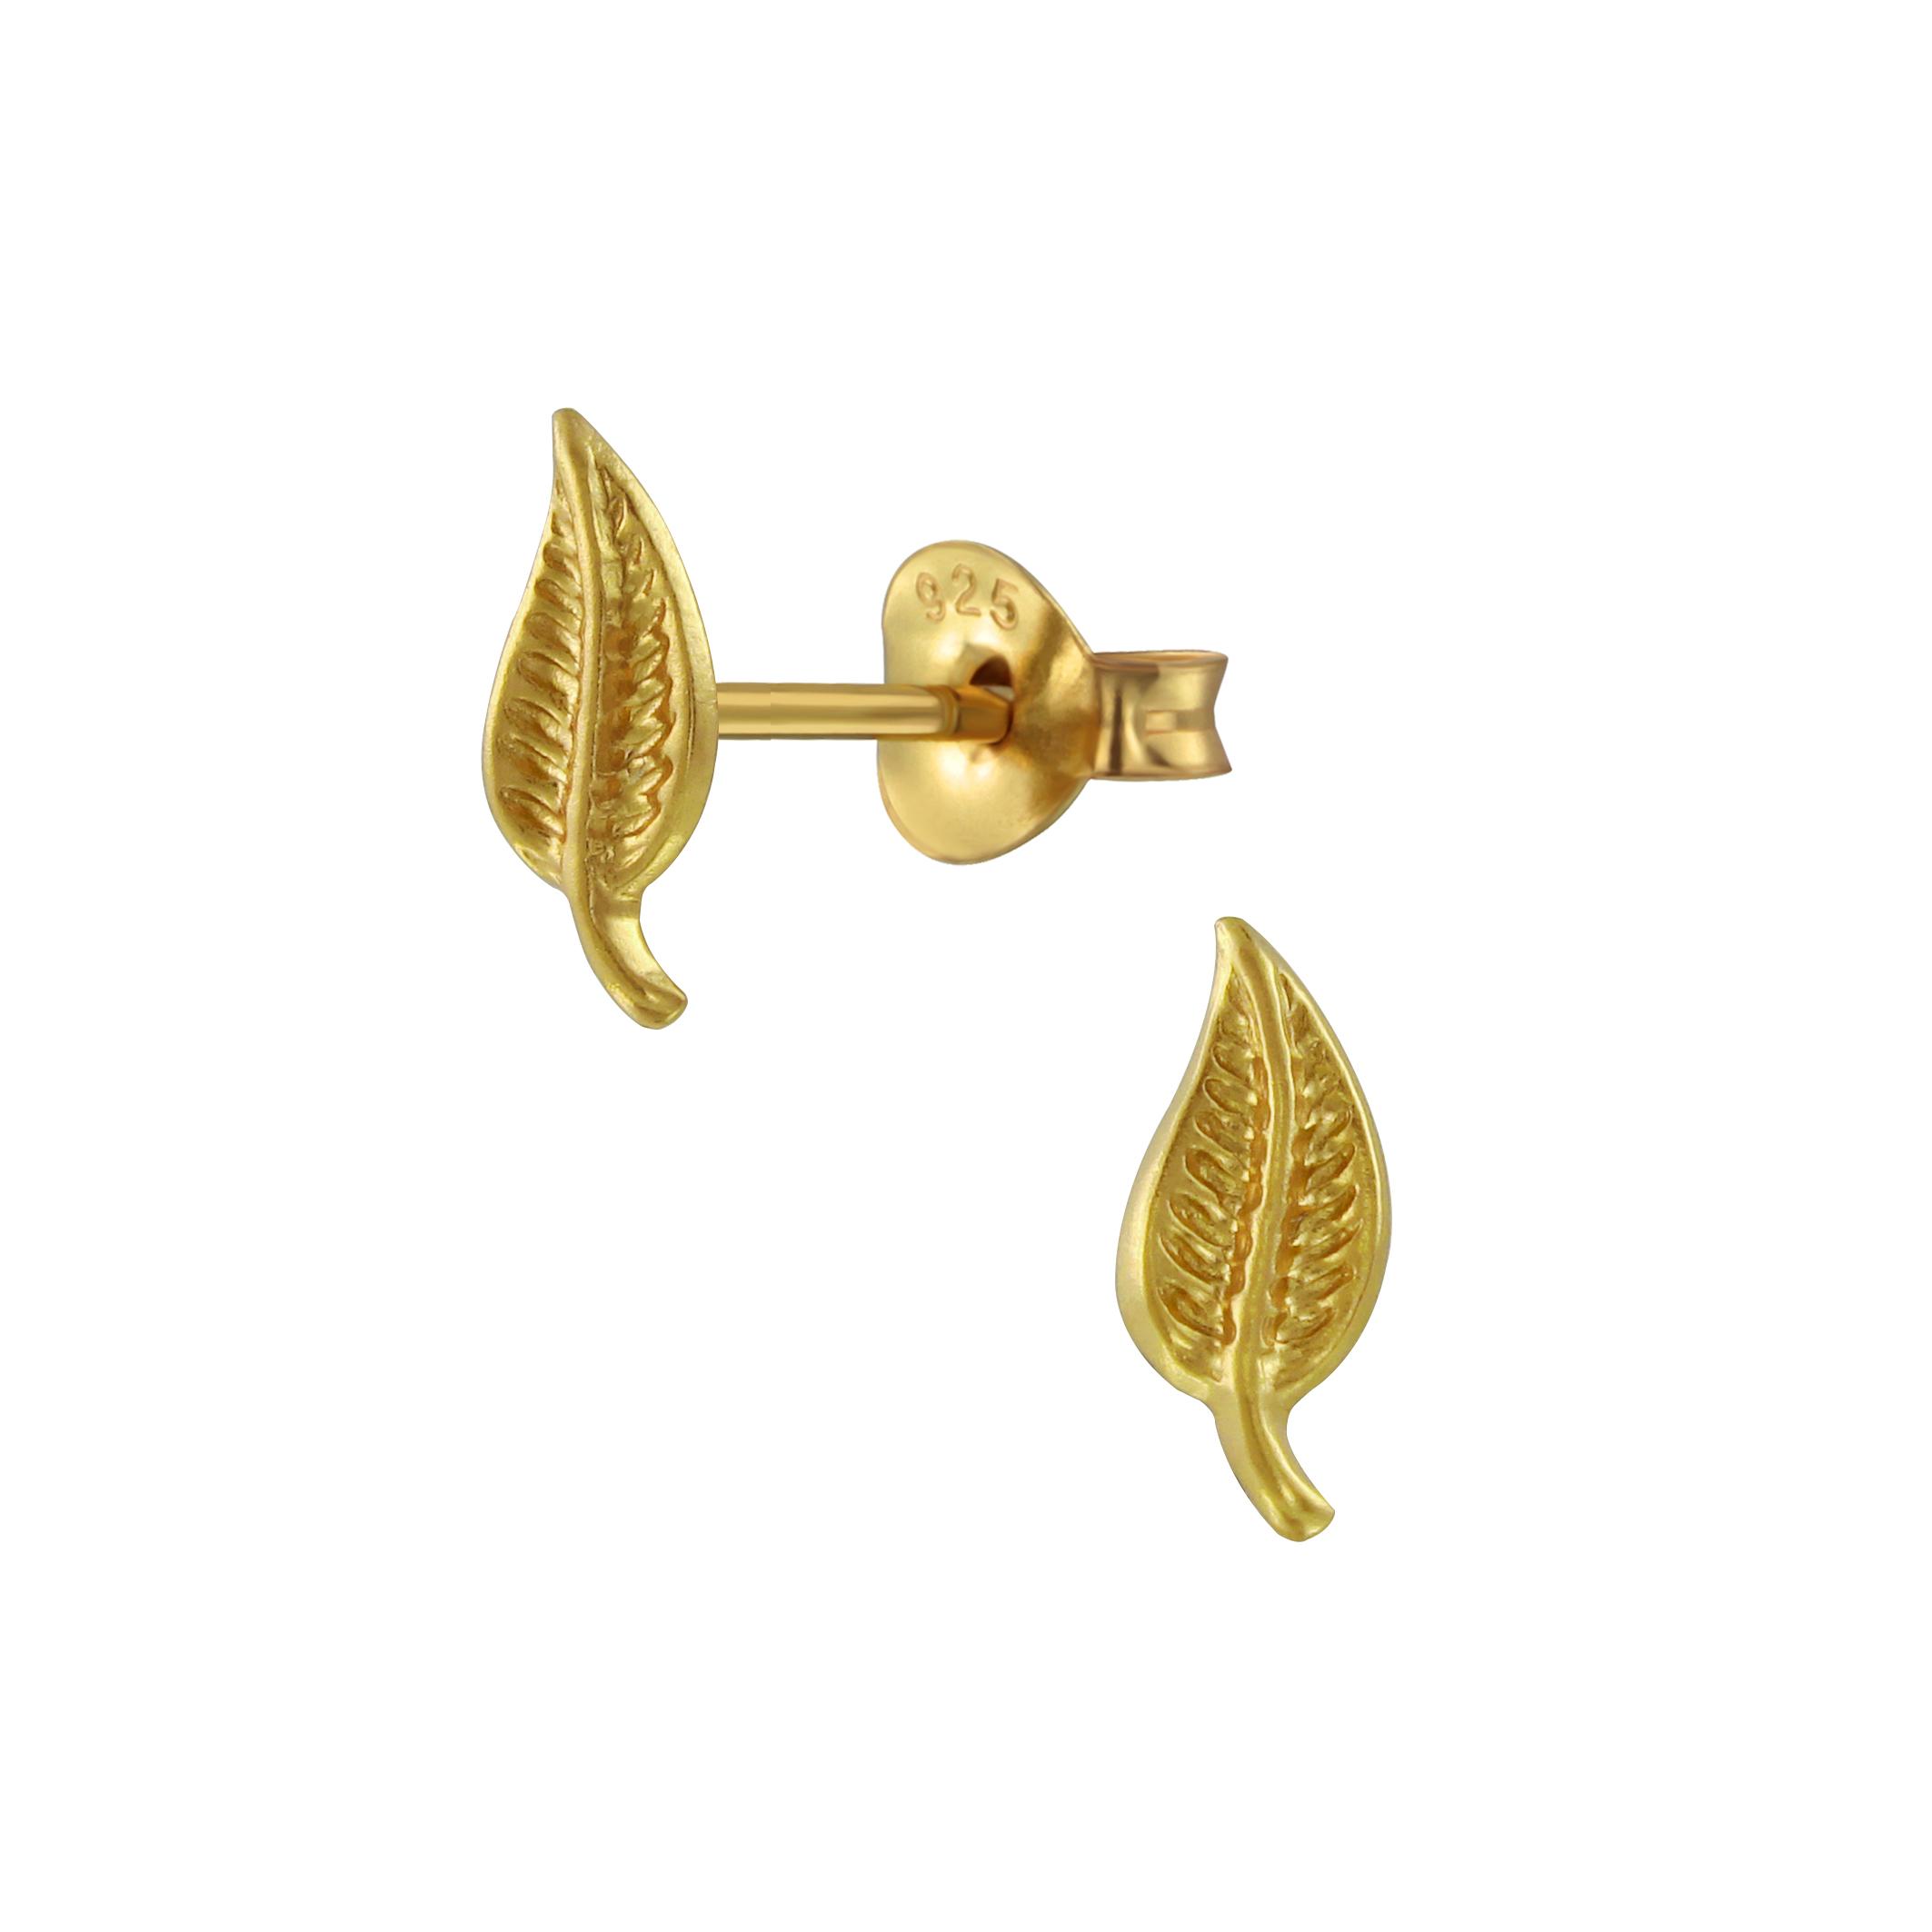 gold-plated nickel free sterling silver leaf post earrings